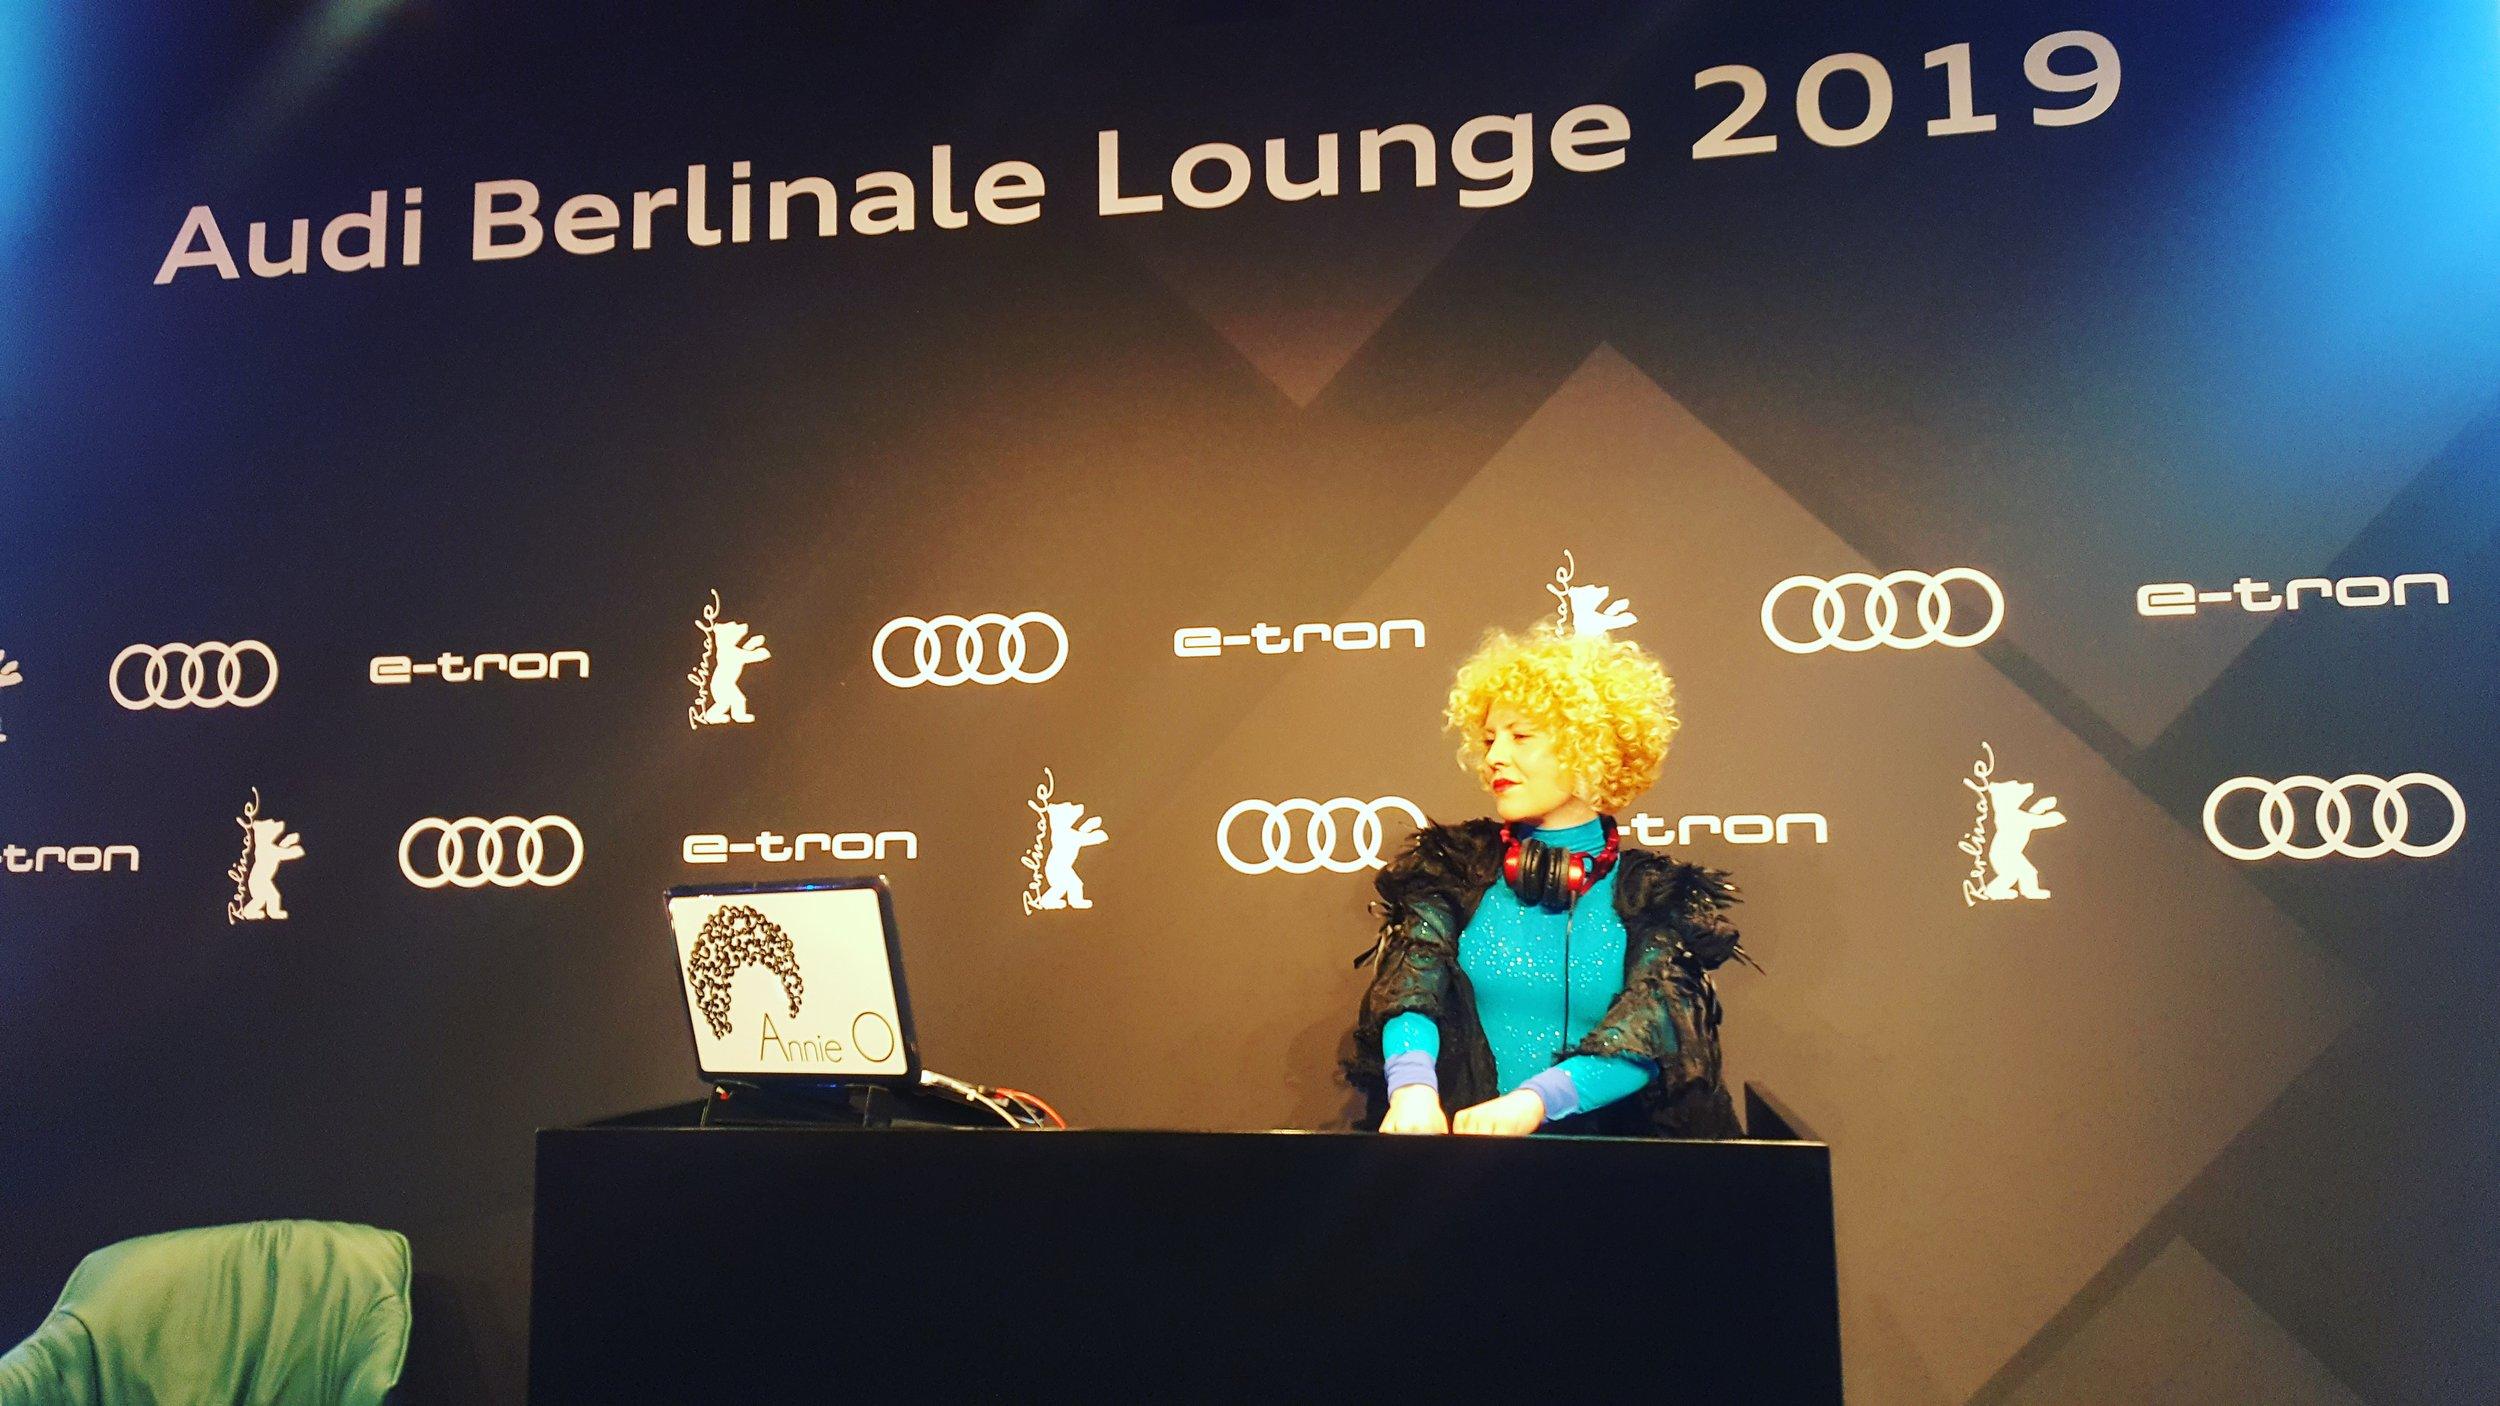 Audi Berlinale Lounge_1.jpg